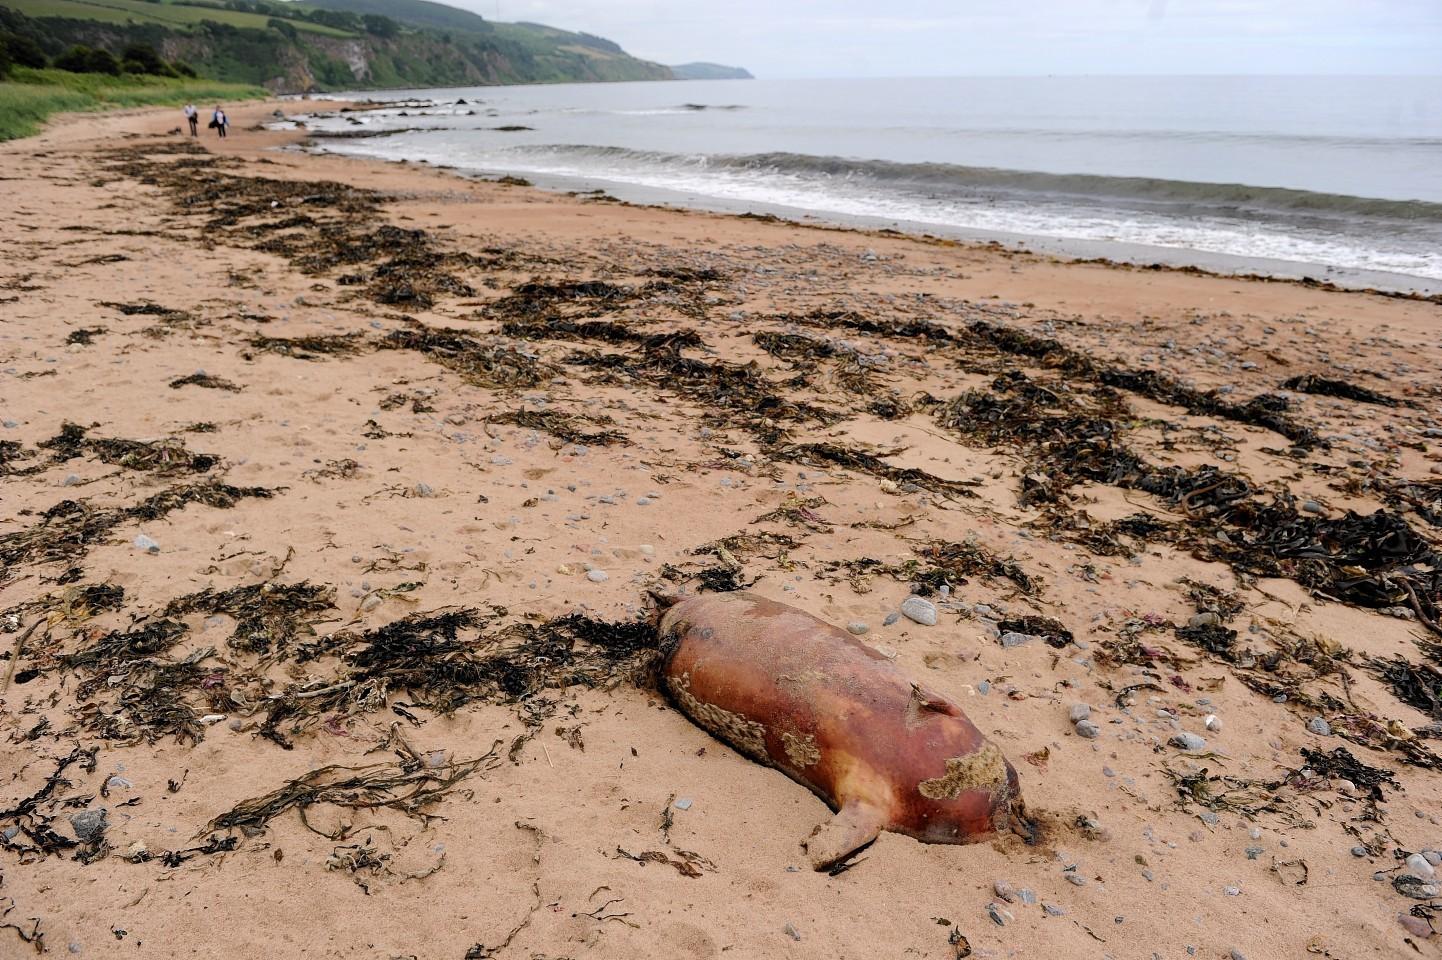 One of the headless seals at  Rosemarkie beach